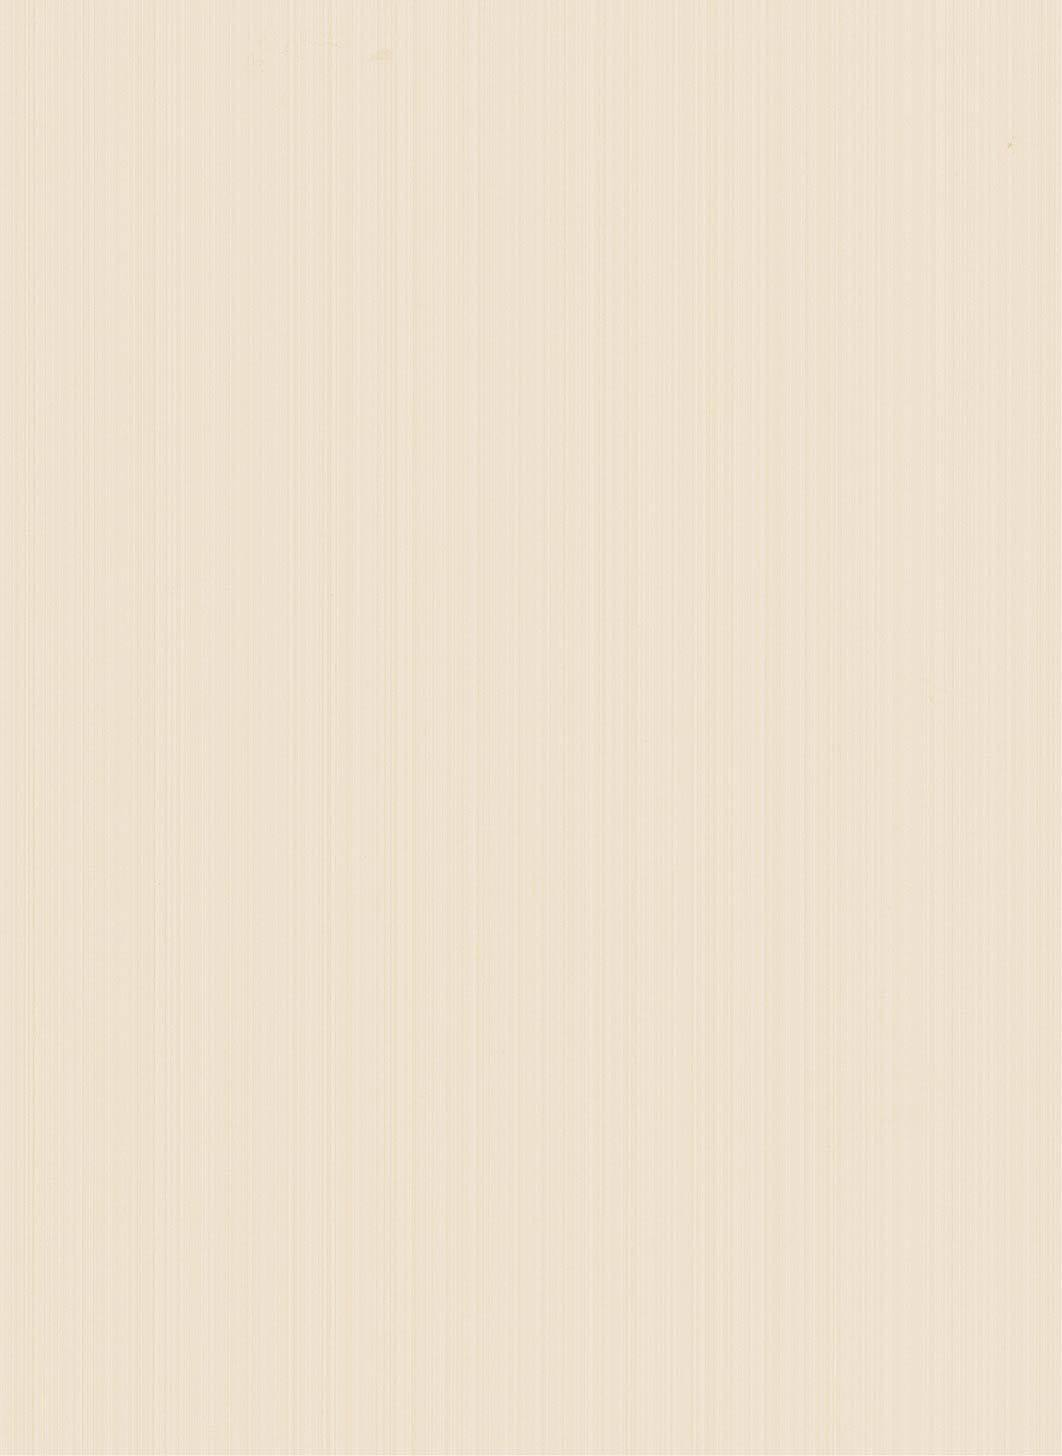 Обои Cole & Son Festival Stripes 96/10054, интернет магазин Волео